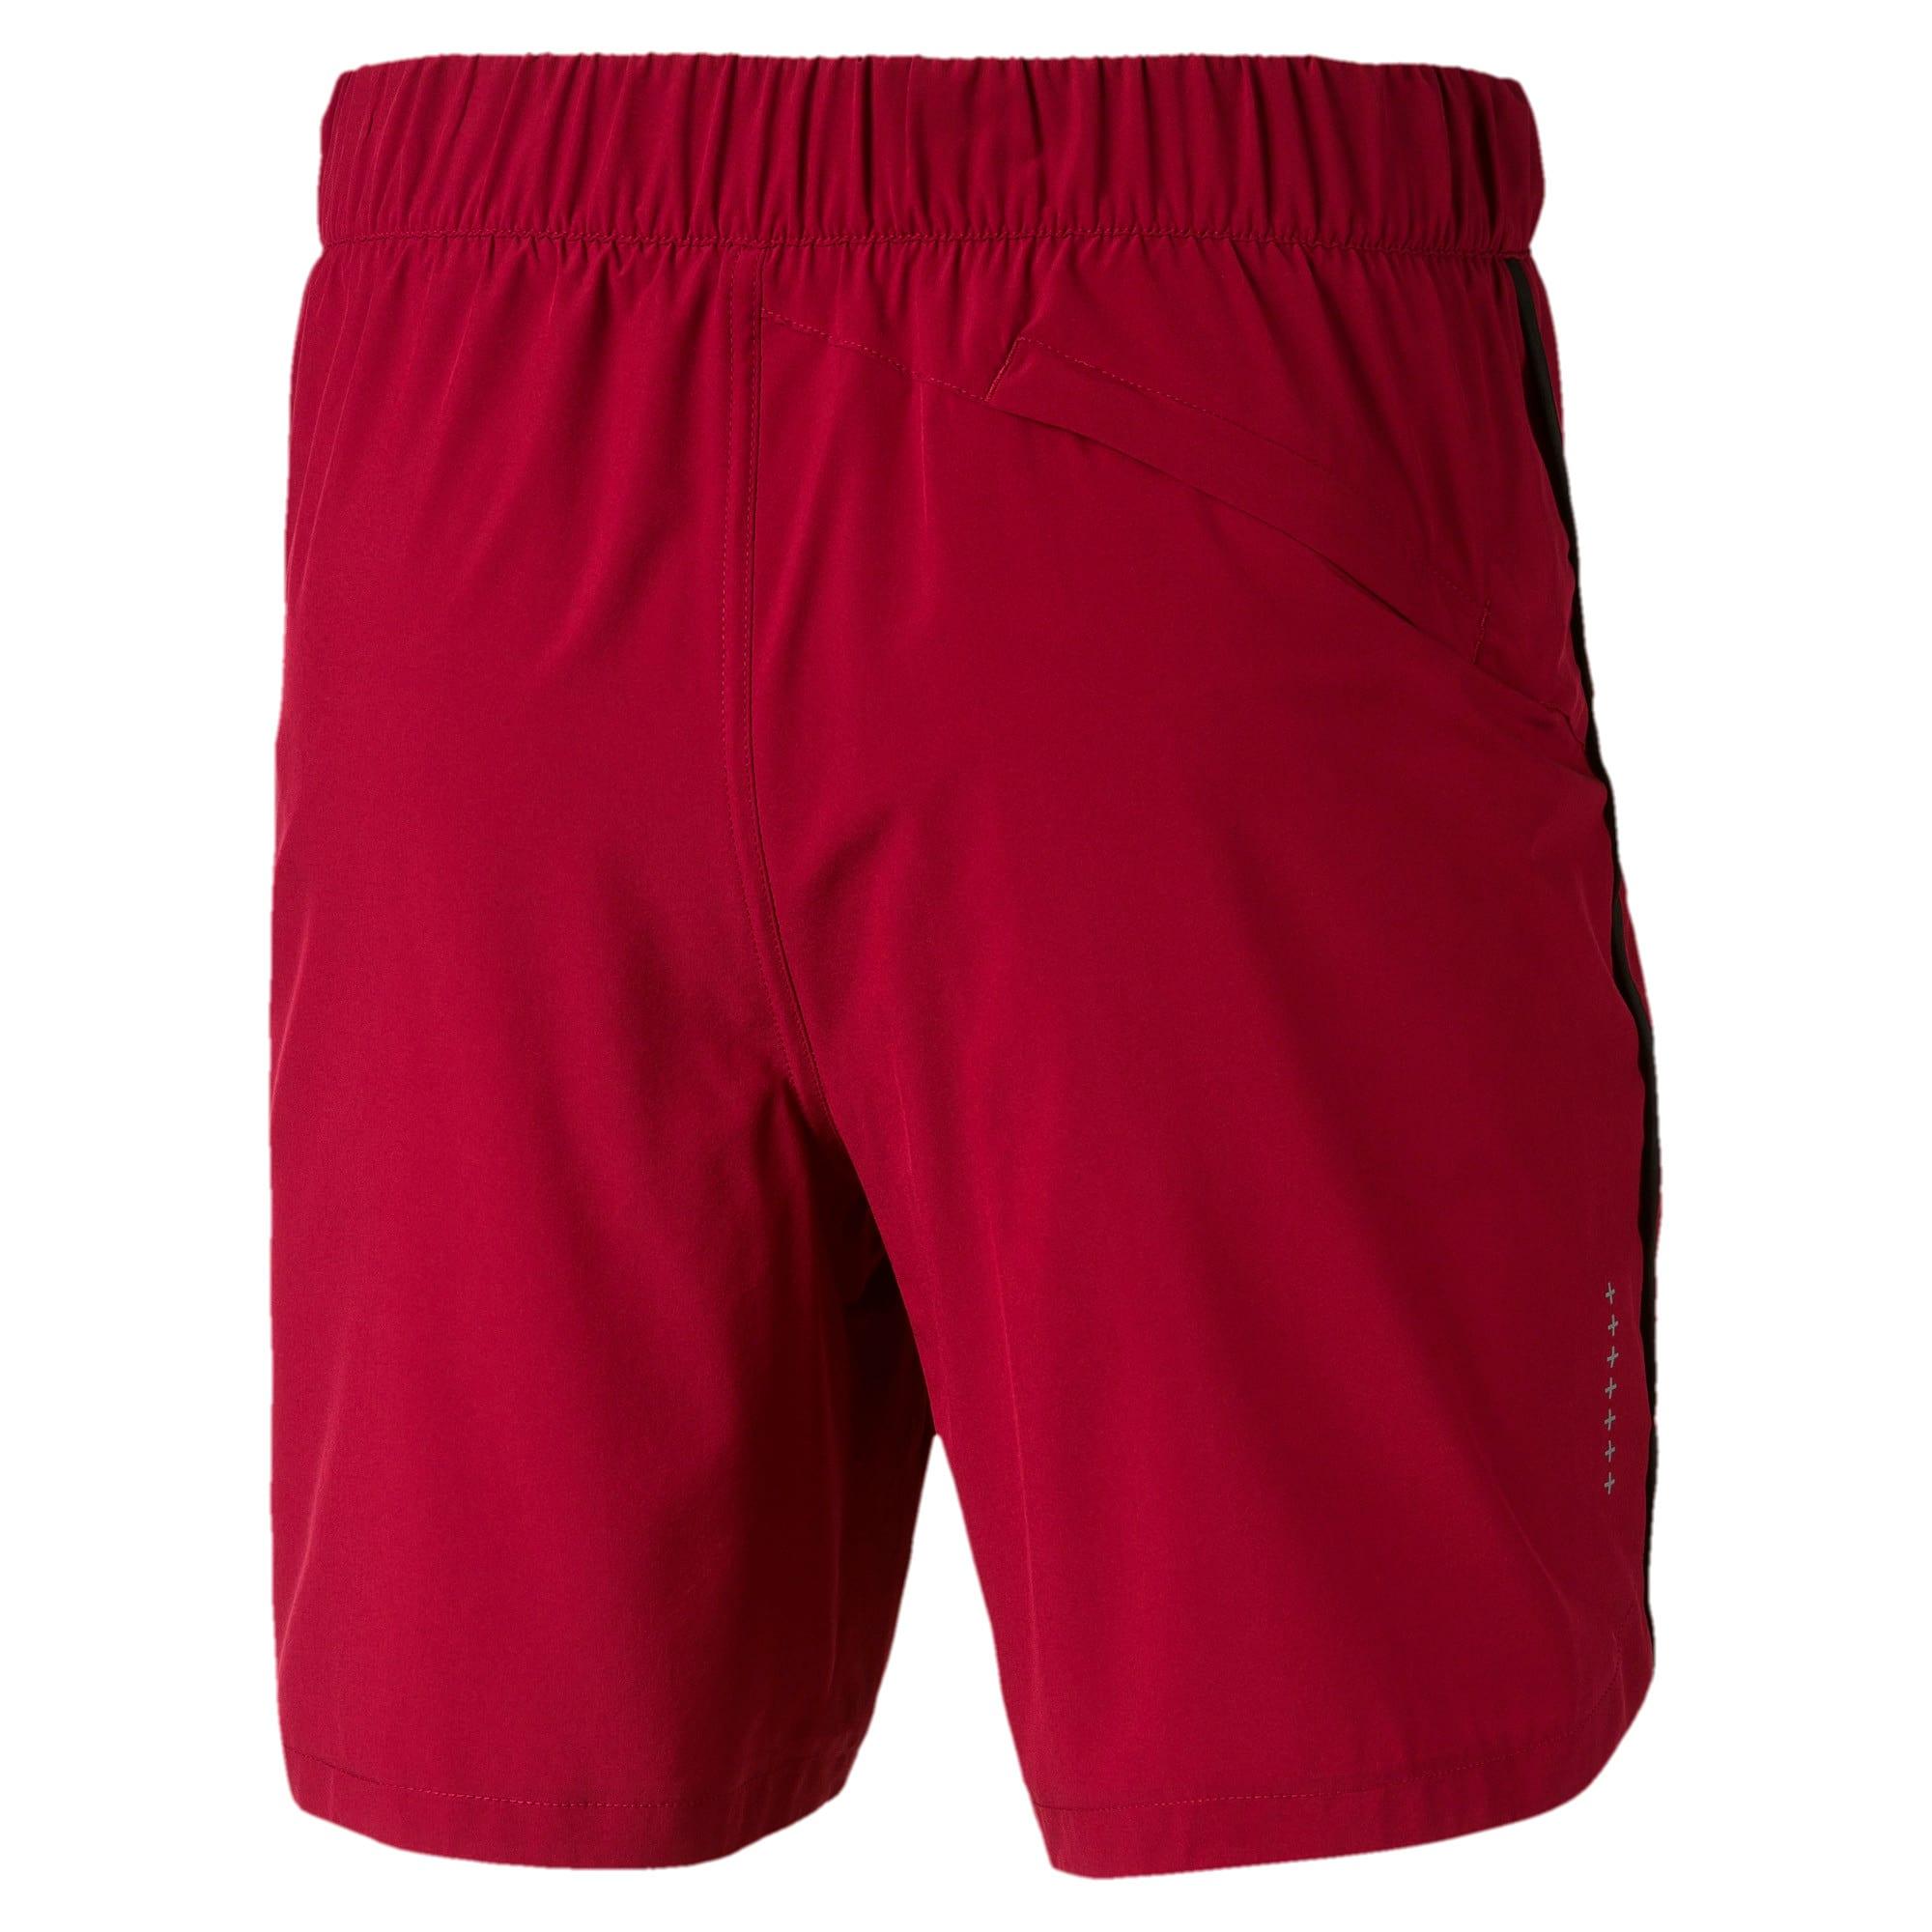 Thumbnail 5 of Get Fast Men's Shorts, Rhubarb-Puma Black, medium